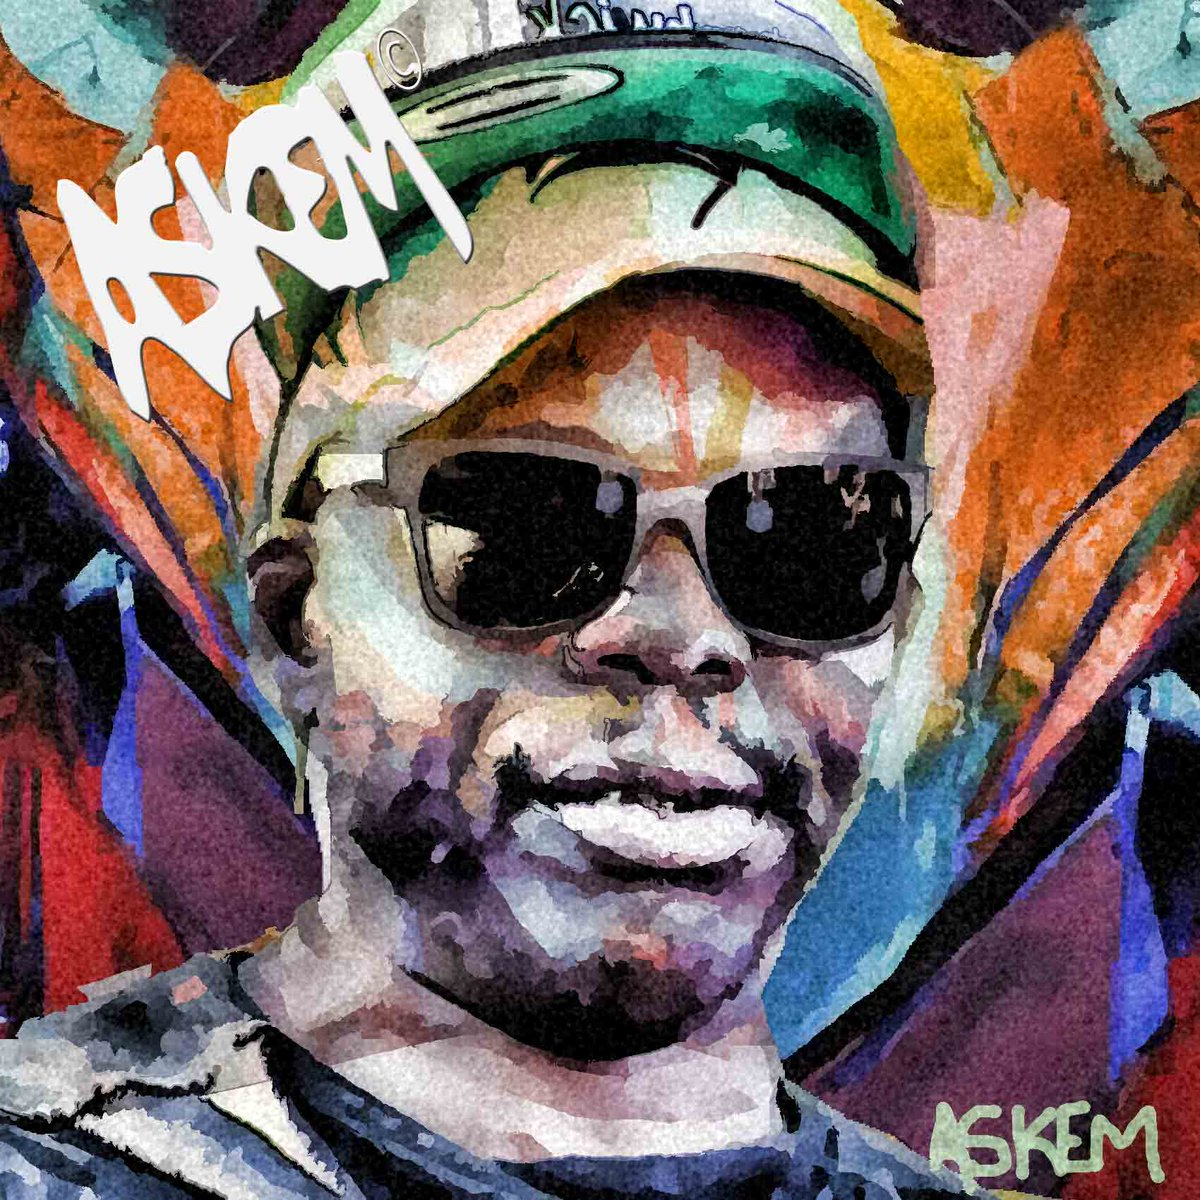 RT @A5KEM: BUSHWICK BILL By ASKEM @A5KEM #artyoucanhear https://t.co/VMeHbKYs6a